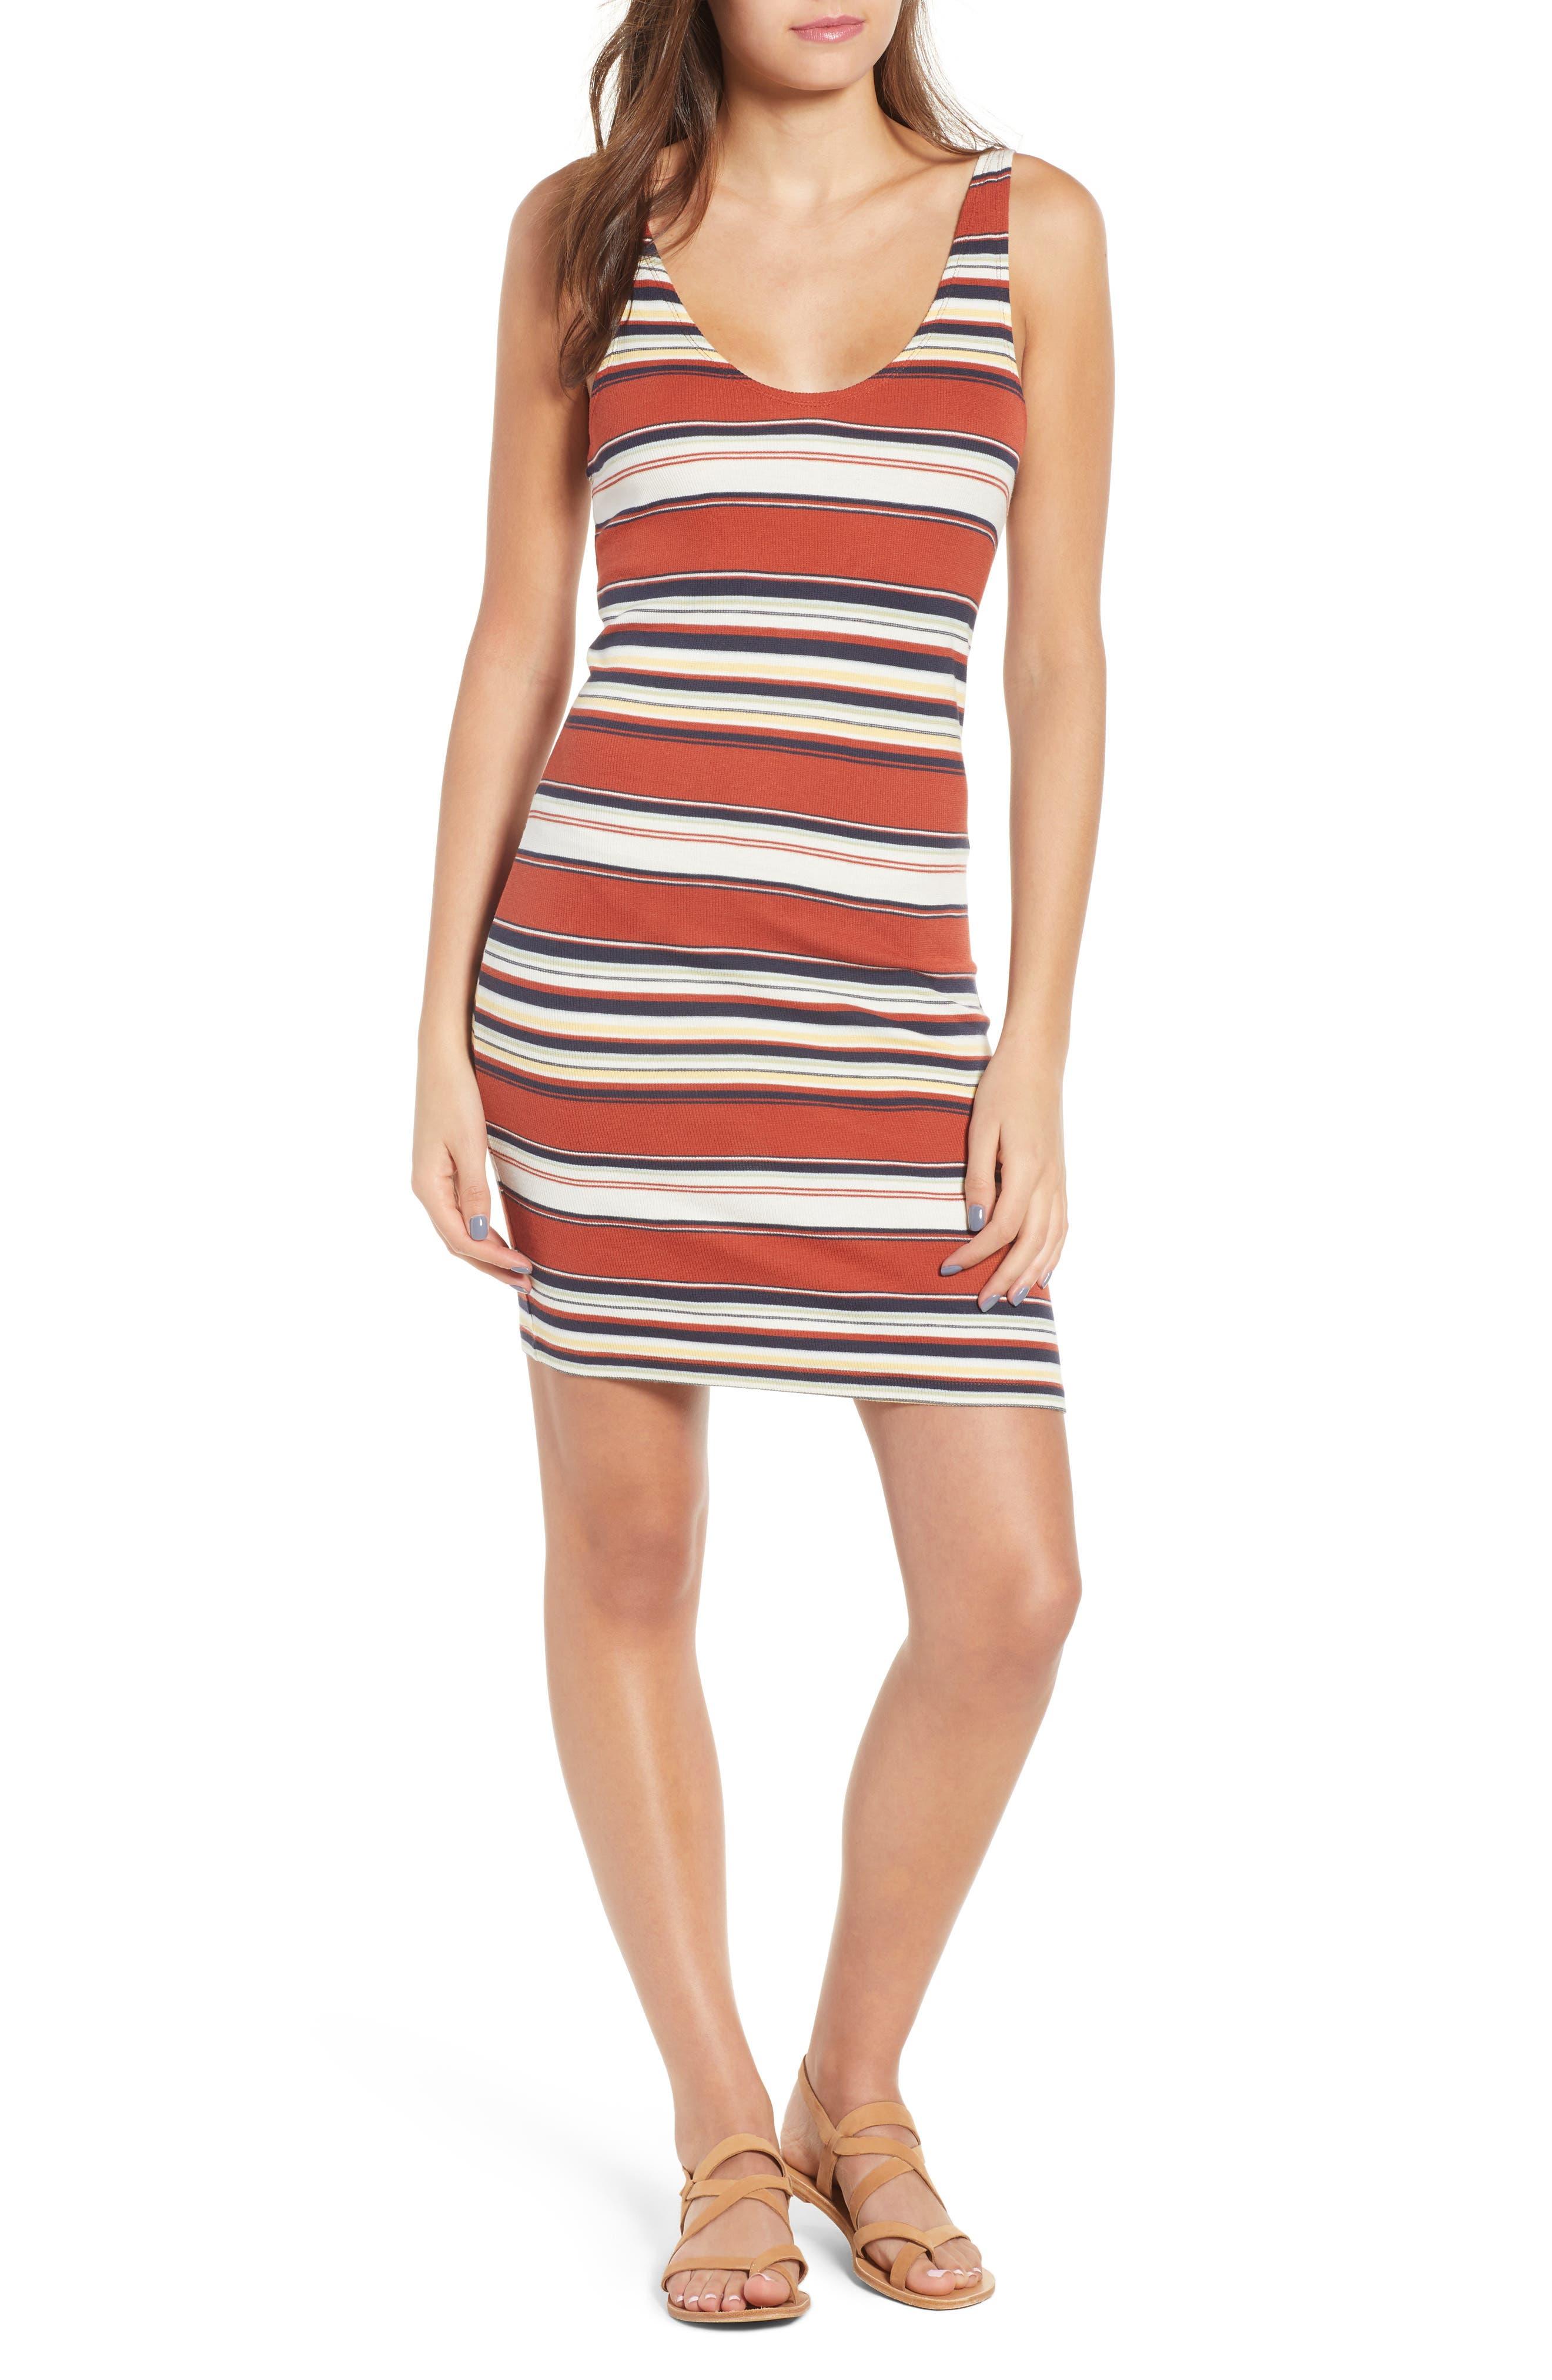 Homesick Stripe Ribbed Dress,                         Main,                         color, Brick Multi